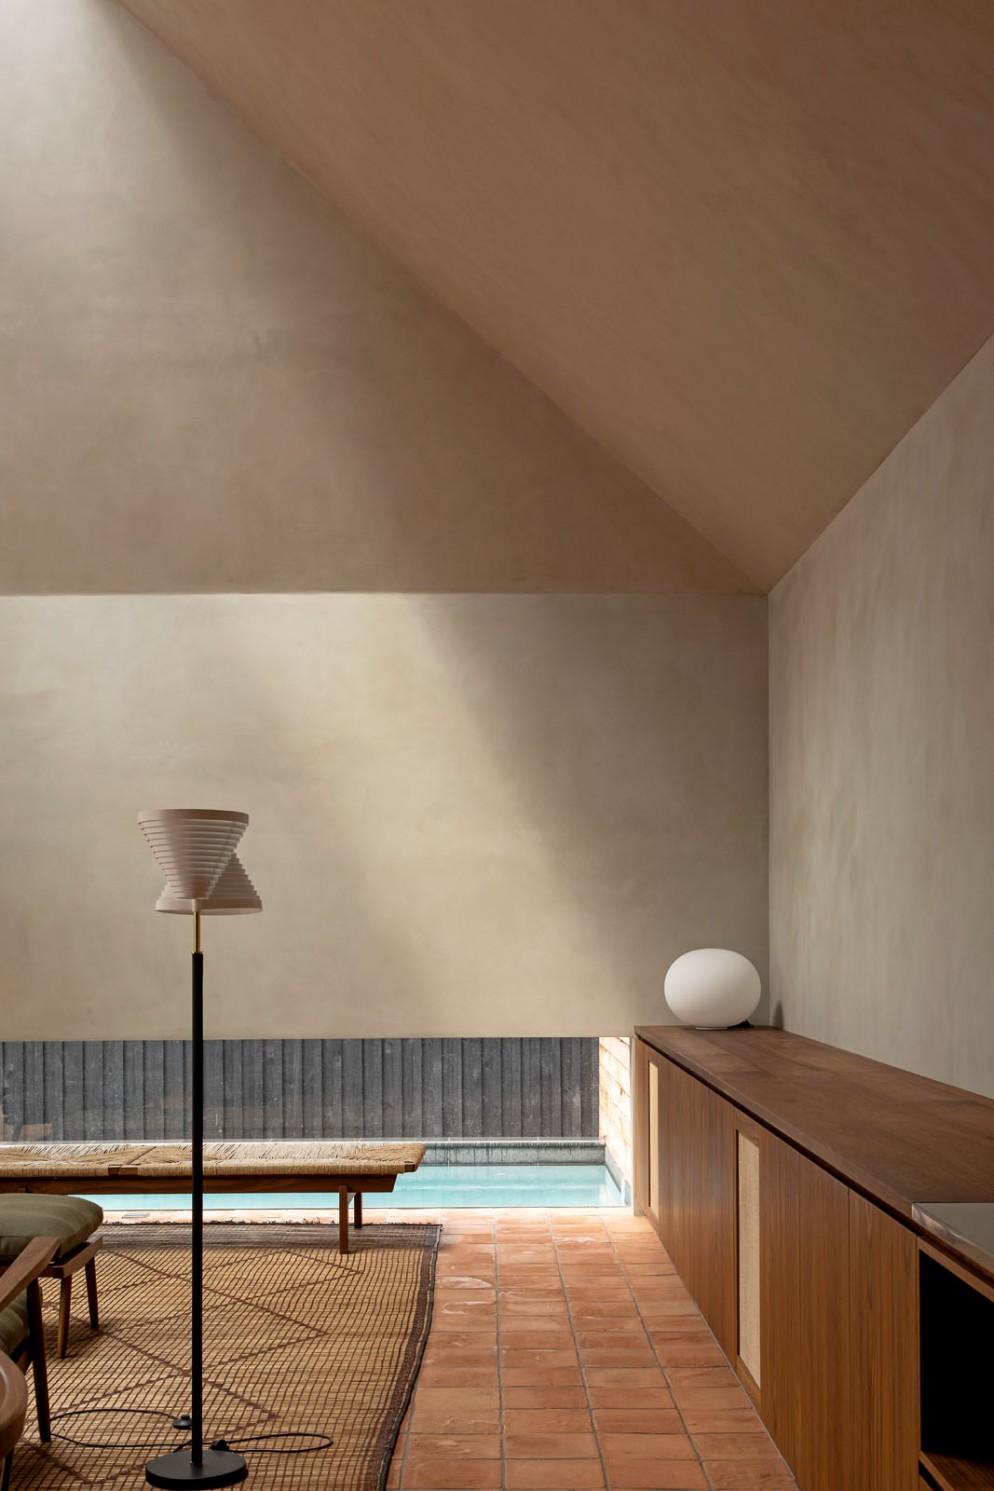 casa-nuova-zelanda-katie-lockhart01